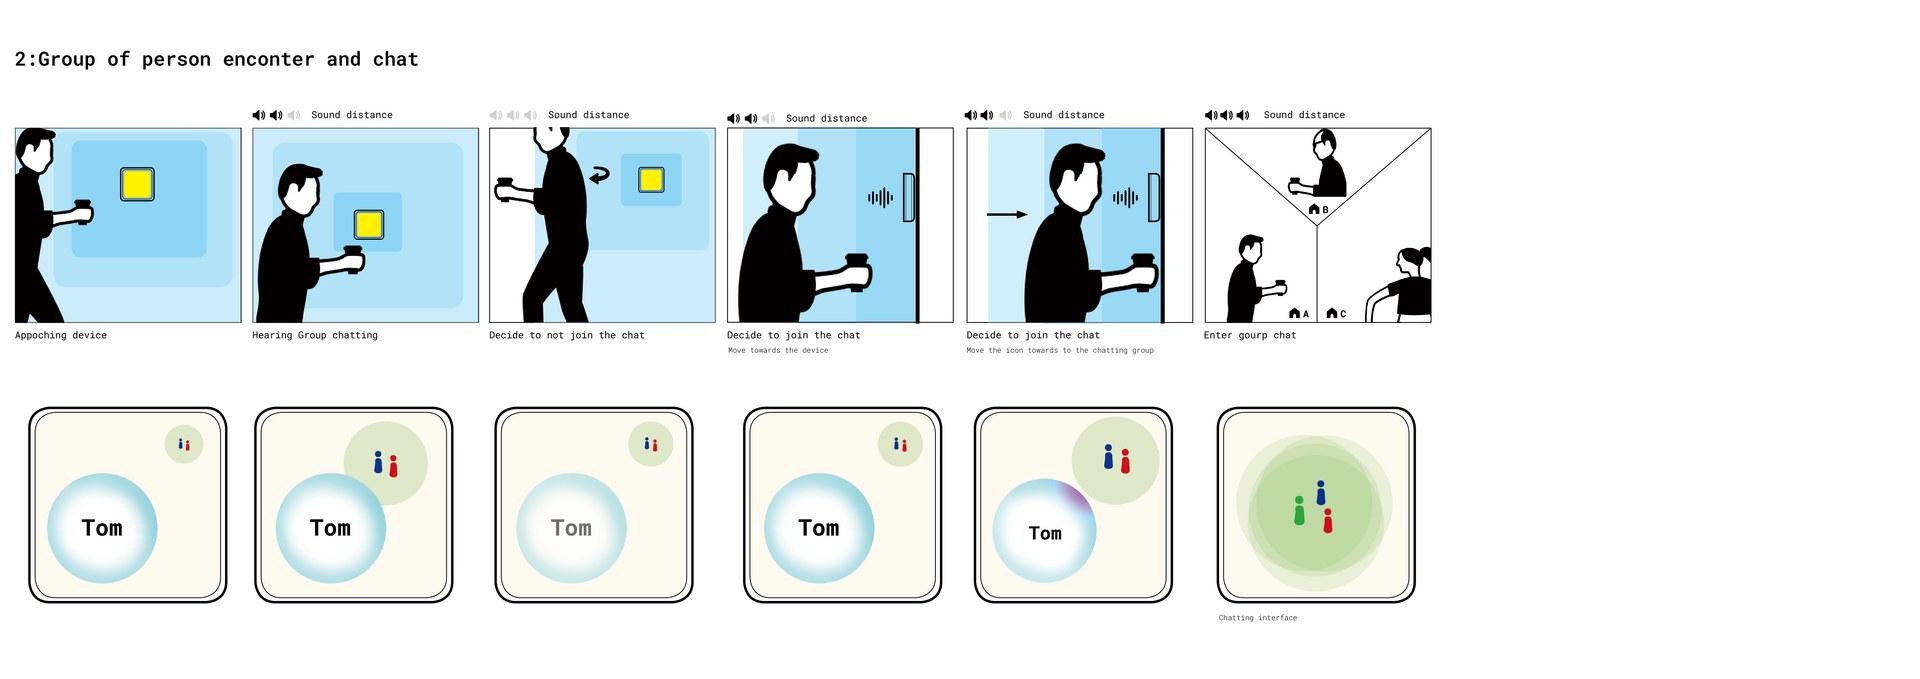 Group of colleagues encounter scenario(1)